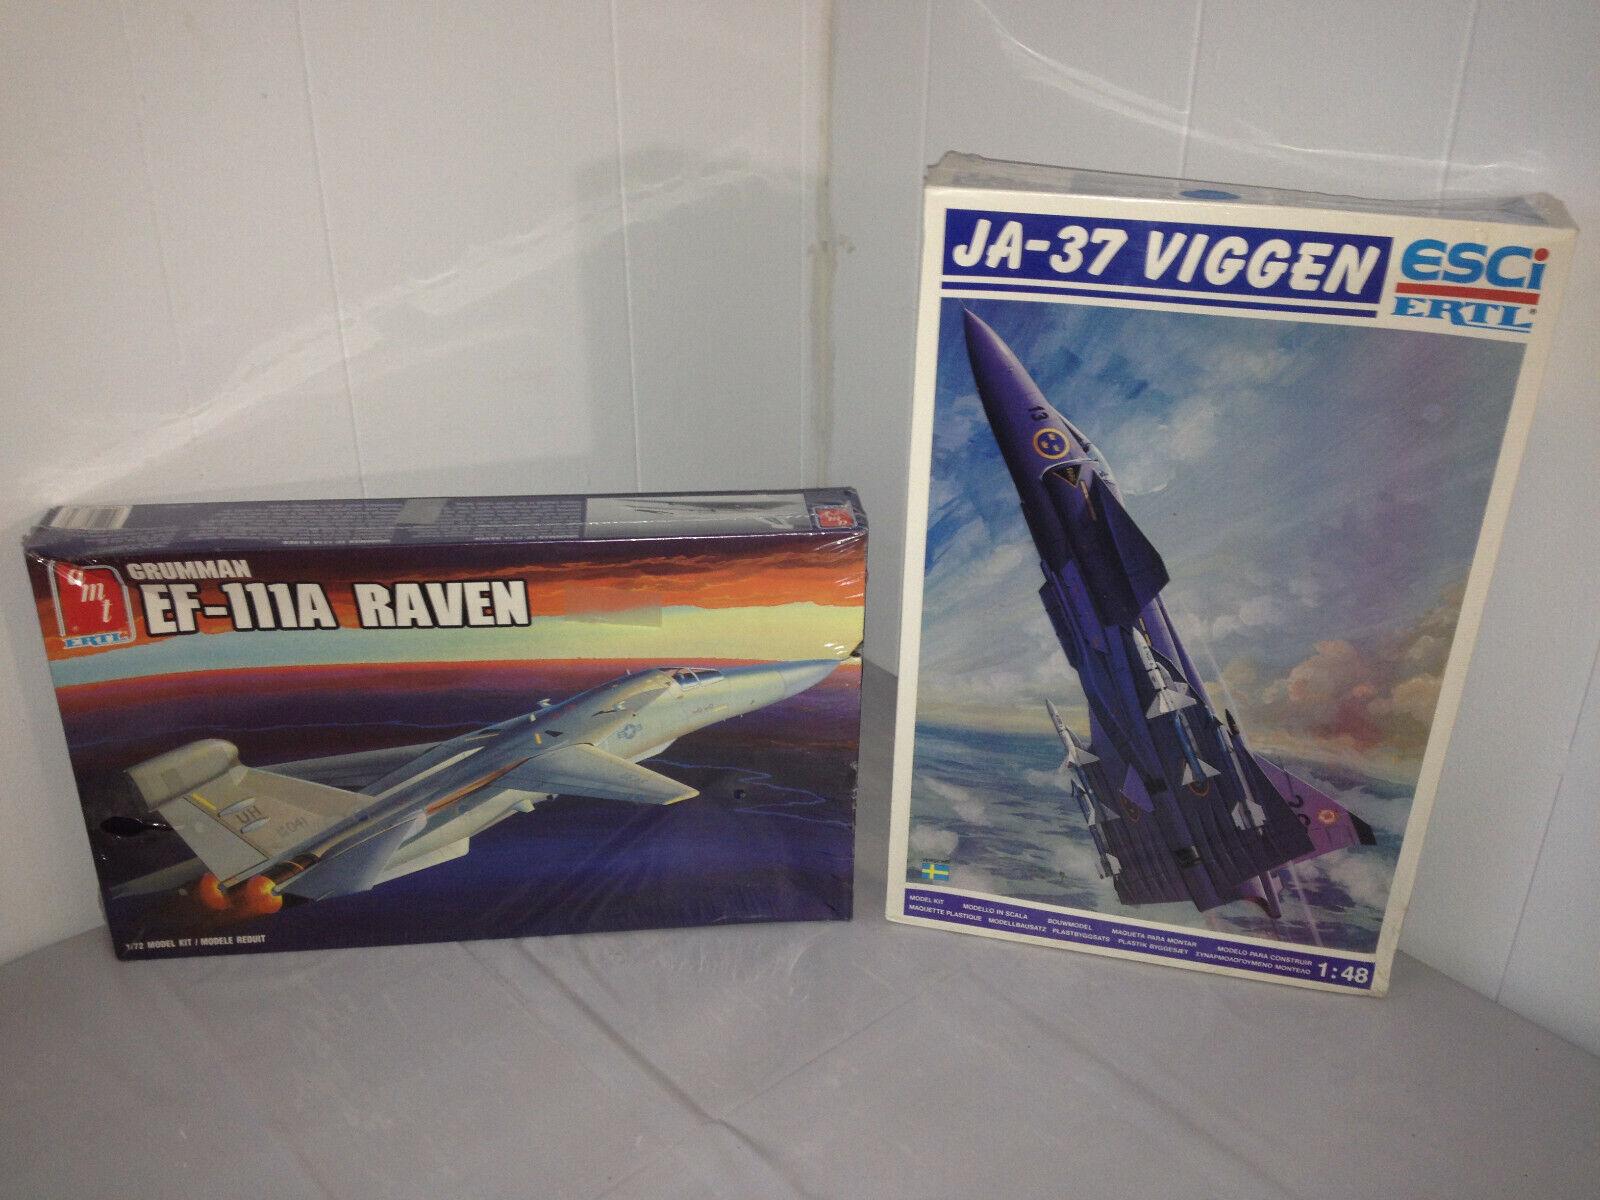 ESCi ERTL JA37 Viggen 1 48 Model + AMT 1 72 Grumman EF-111A Raven Sealed Jet Lot